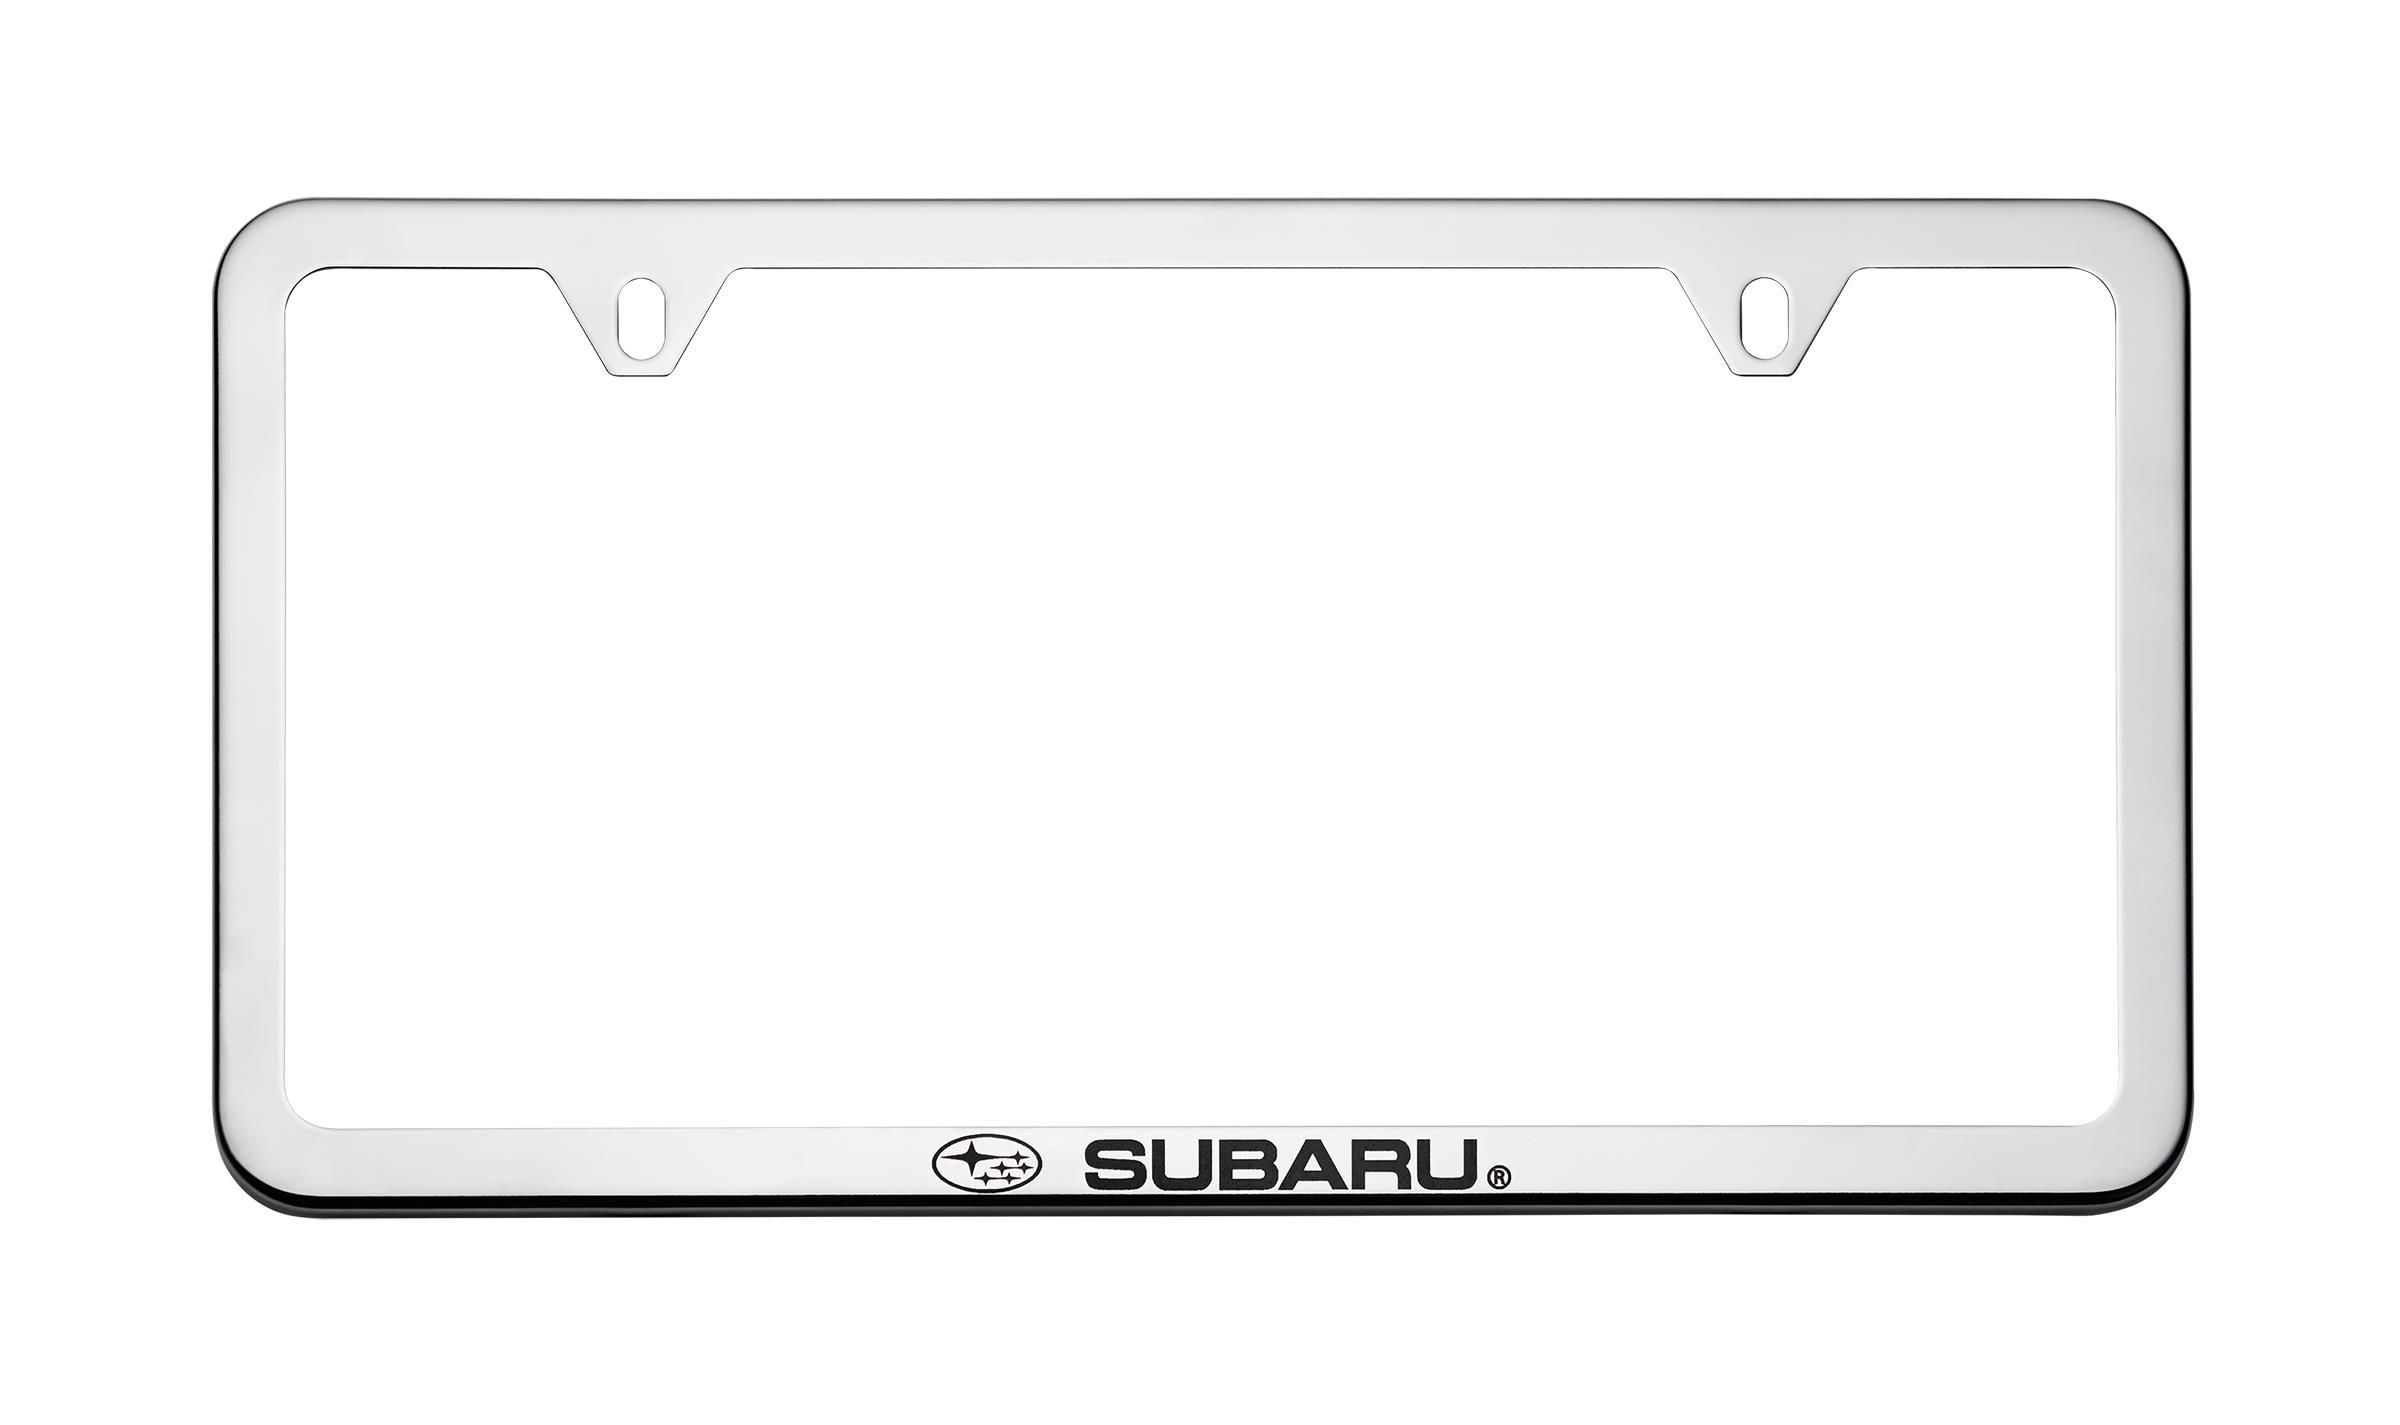 exterior view all 2016 subaru crosstrek exterior accessories subaru license plate frame